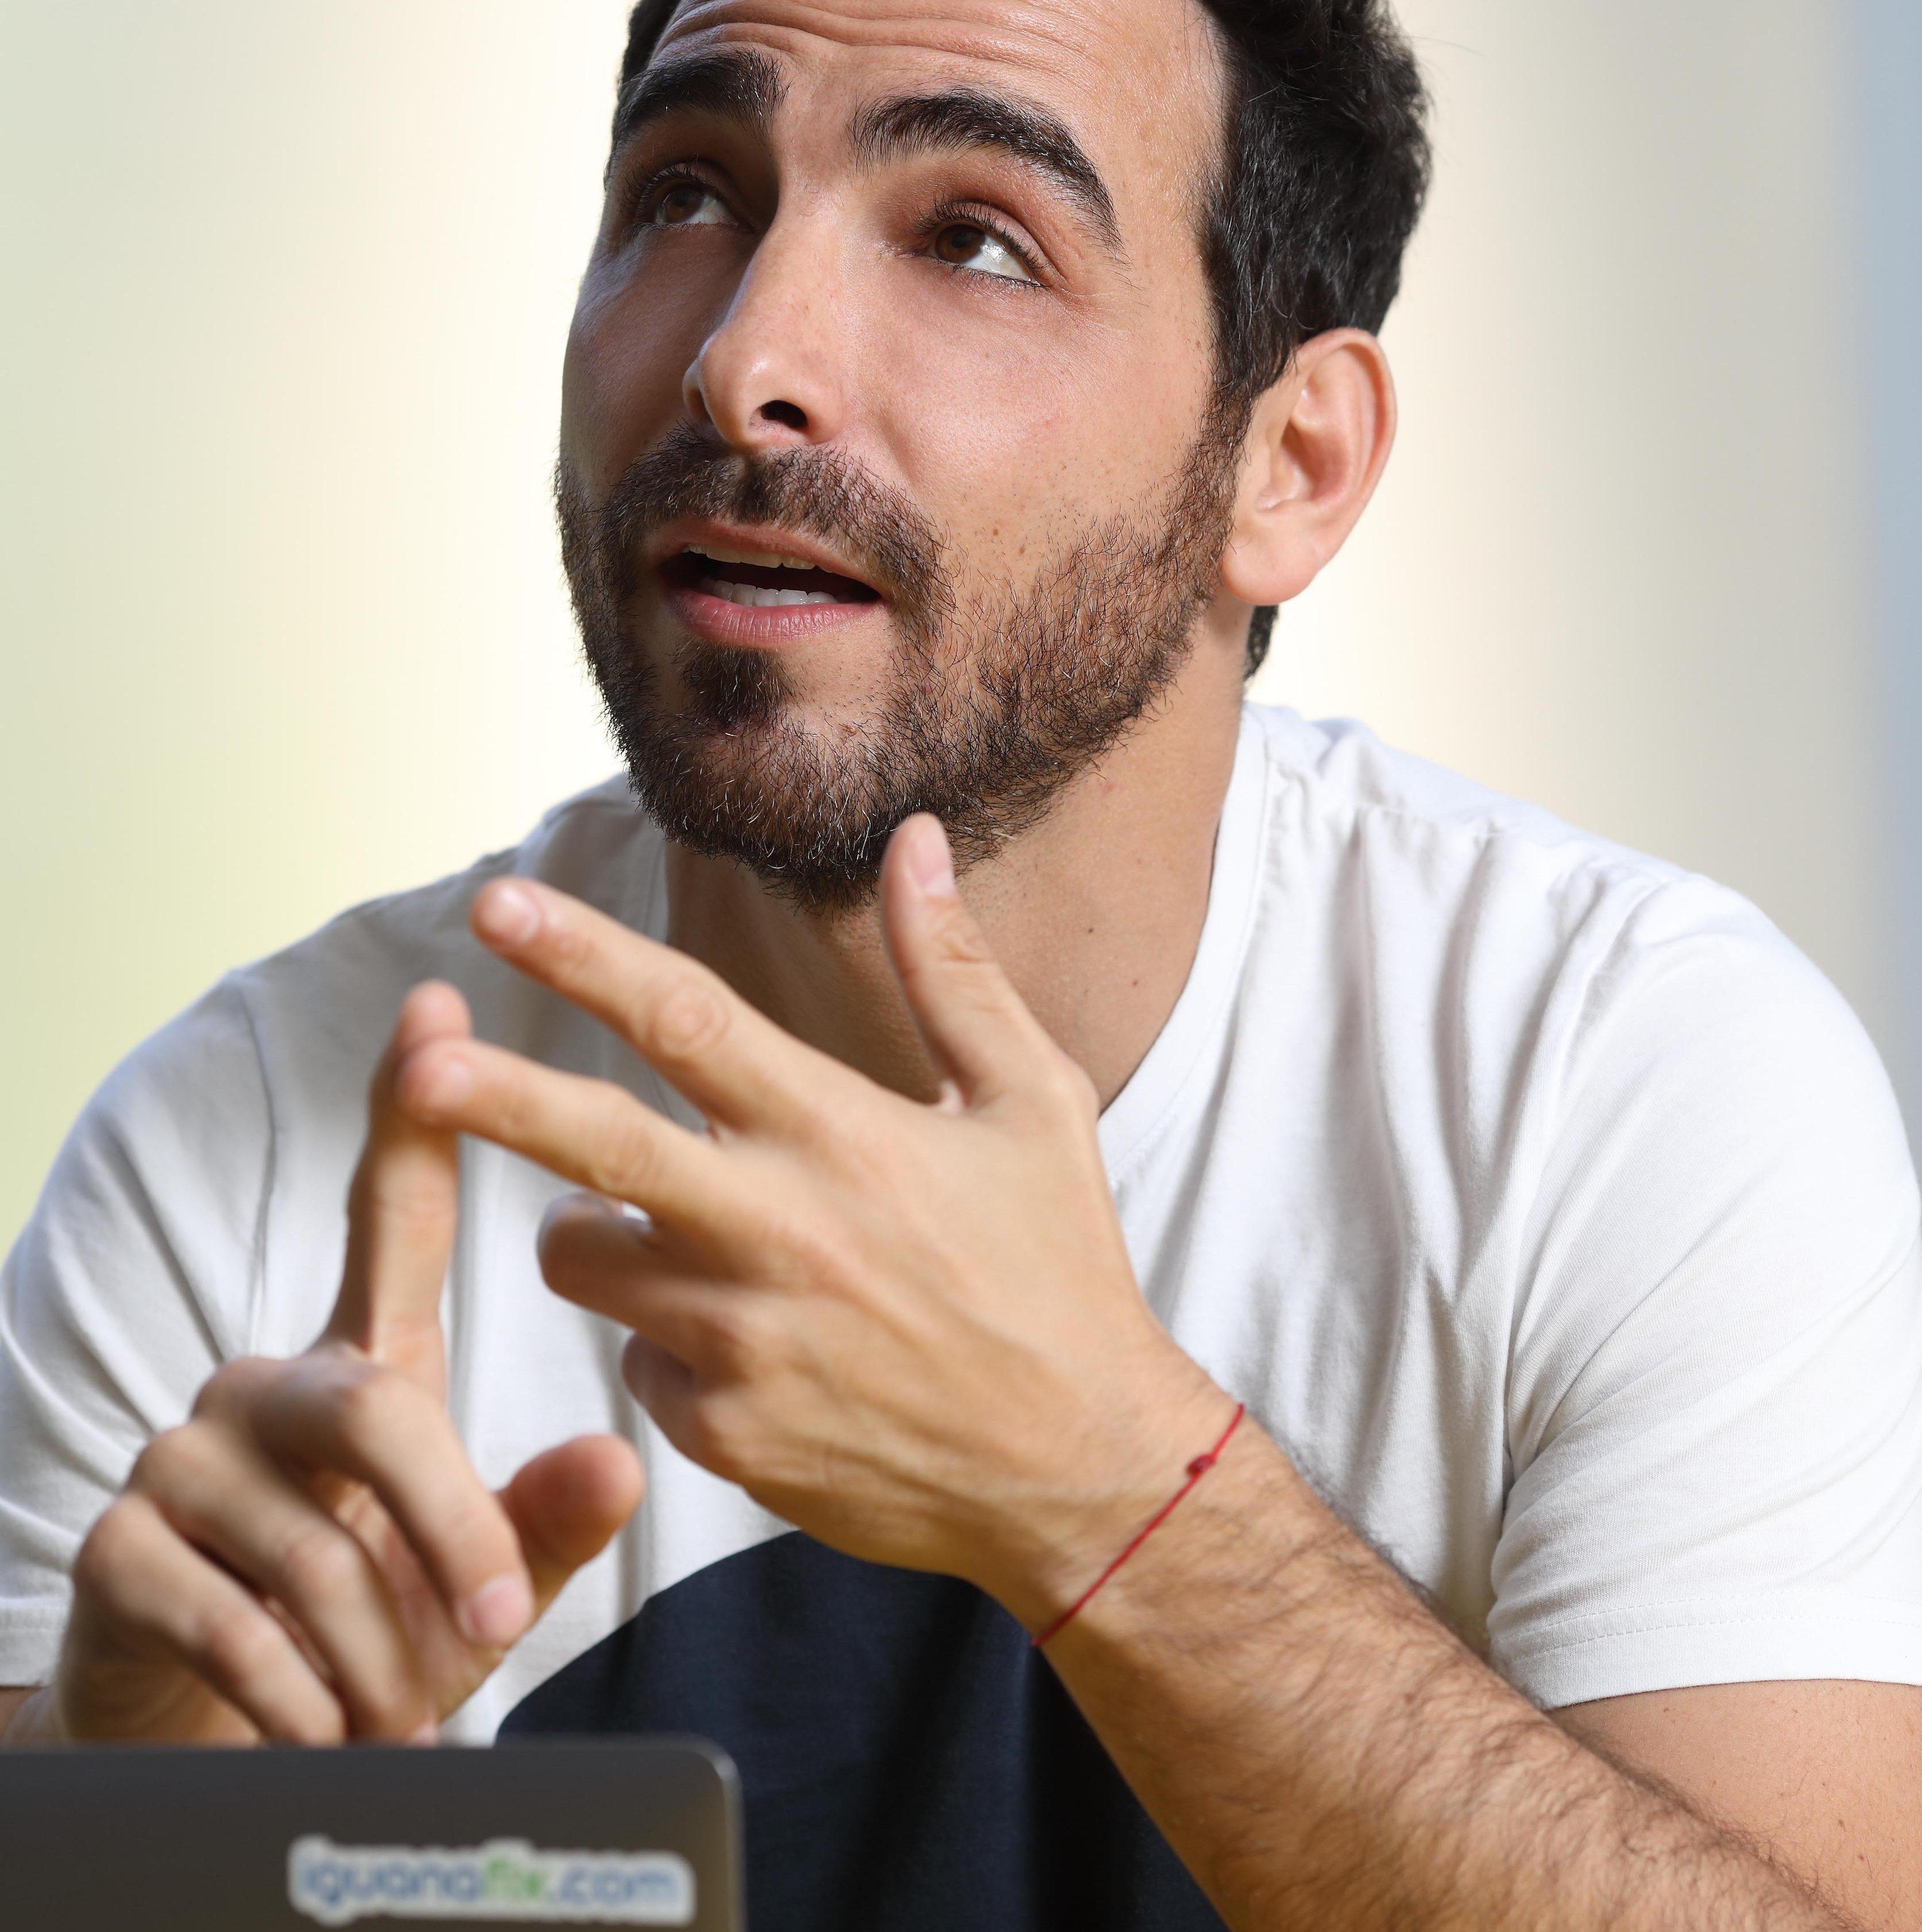 Entrepreneurs Stories - IguanaFix - Matias Recchia